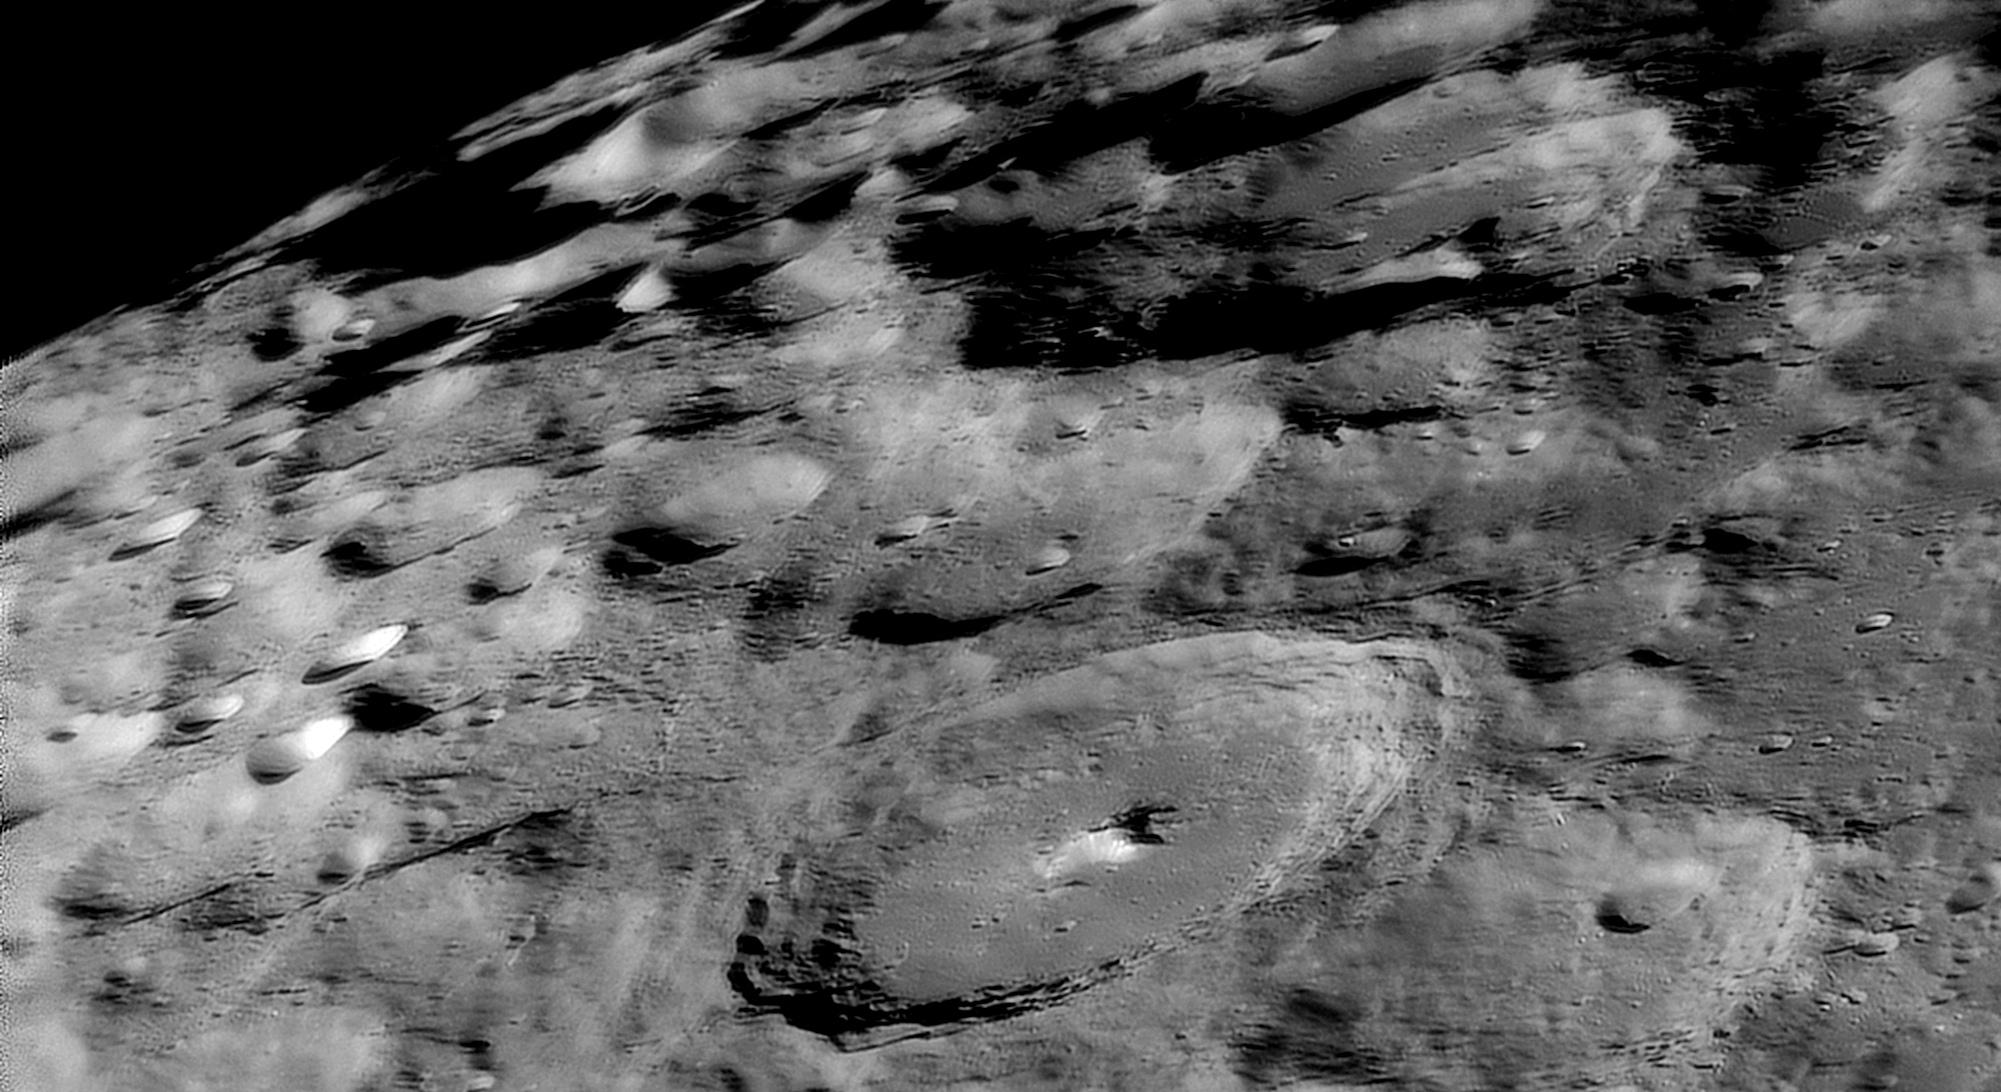 large.2021-02-23-2054_7-R-Moon-FI.jpg.af36fcc061ae0d72d53b1bb5e4256d02.jpg